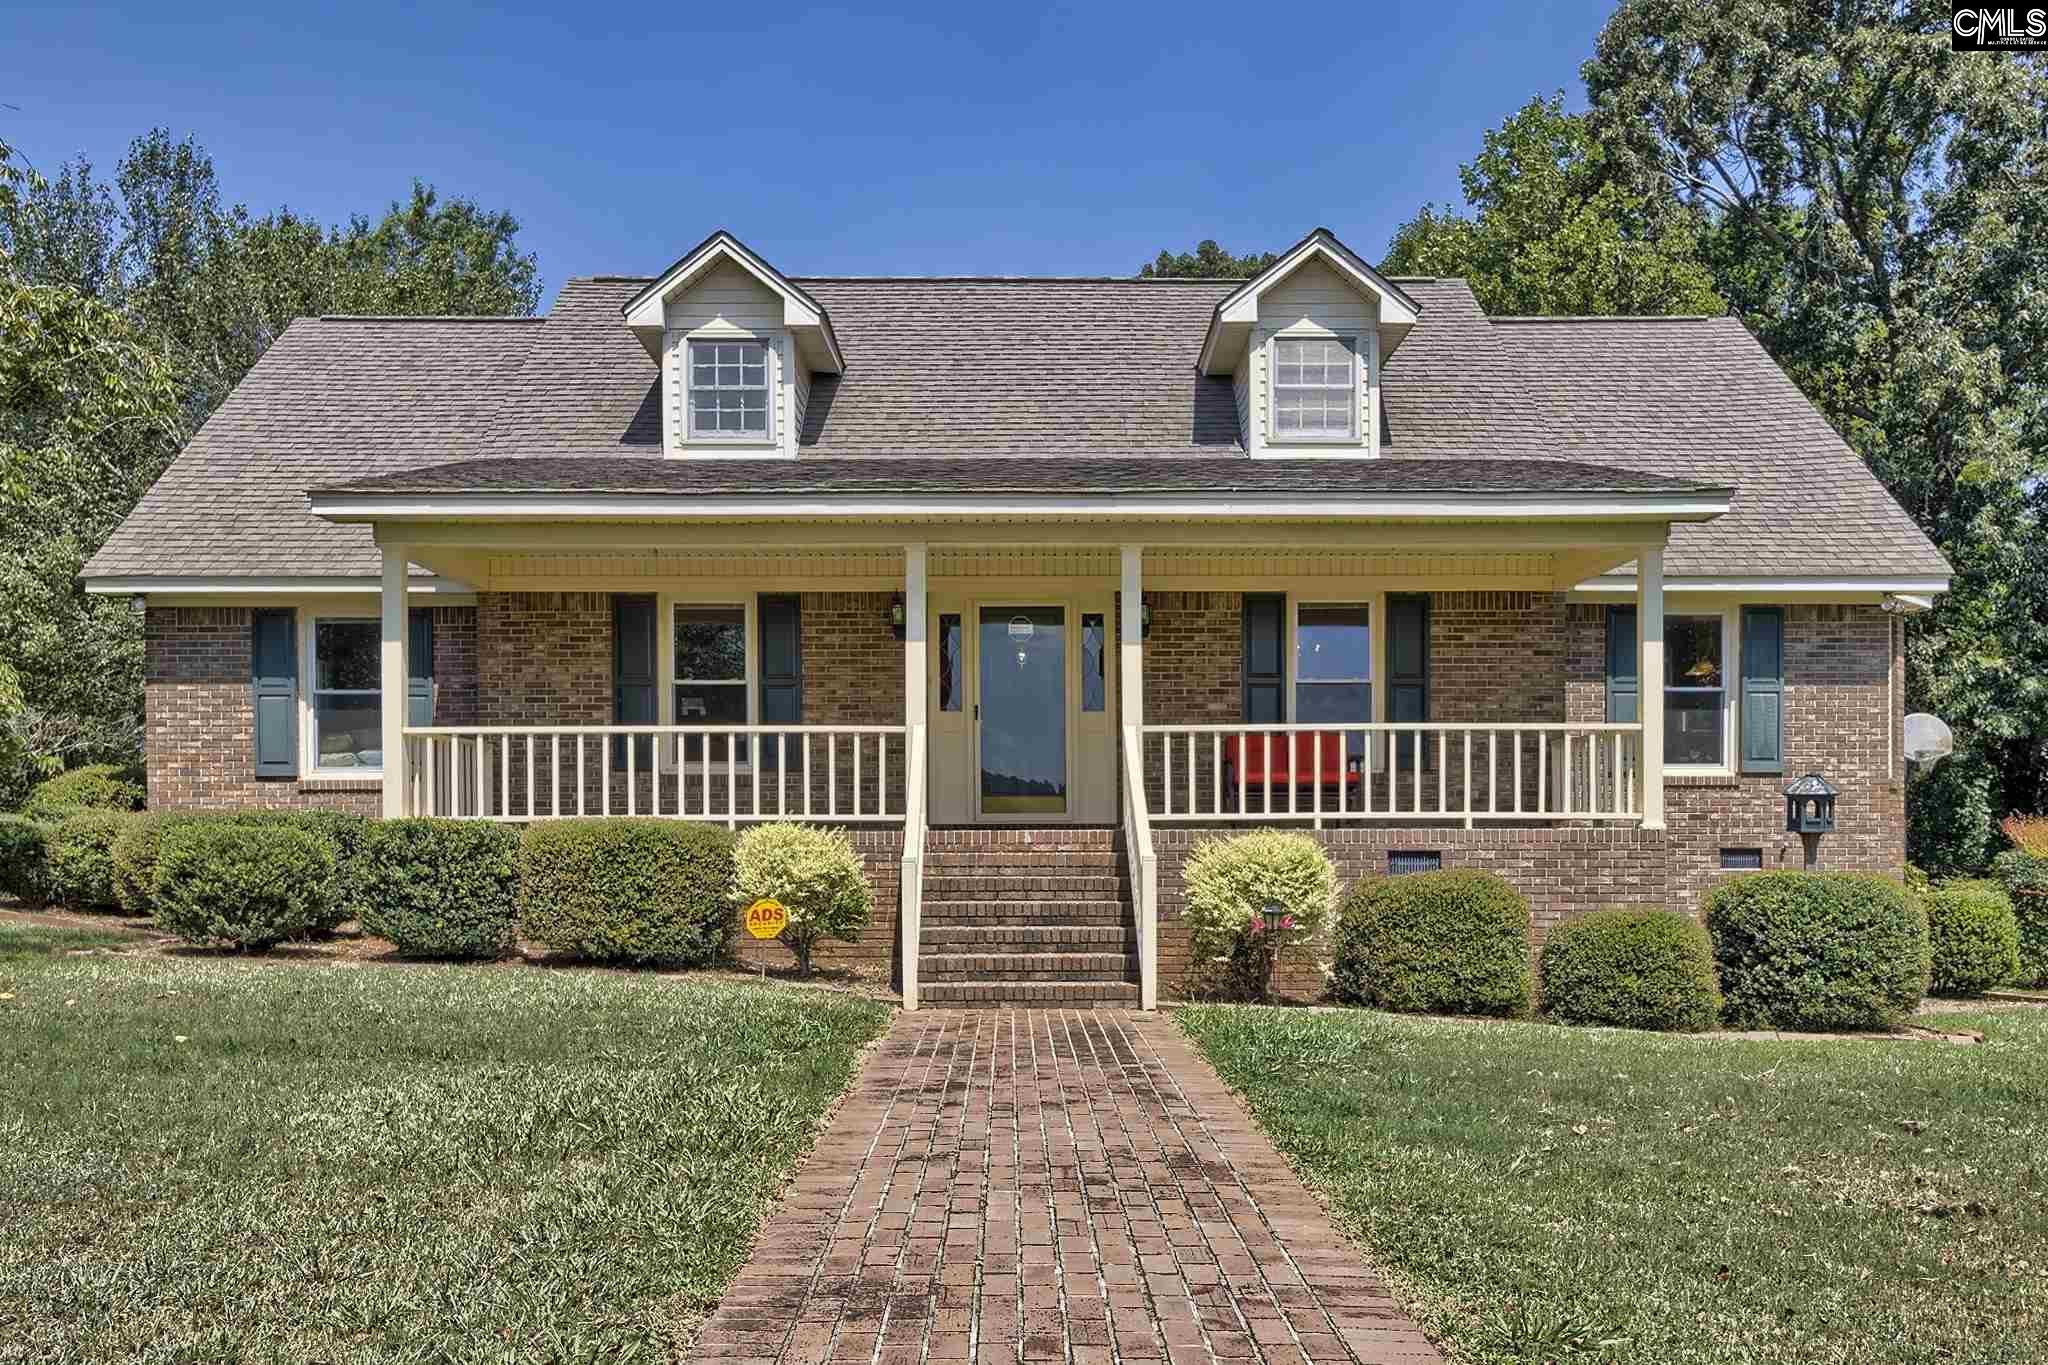 1279 Smallstown Winnsboro, SC 29180